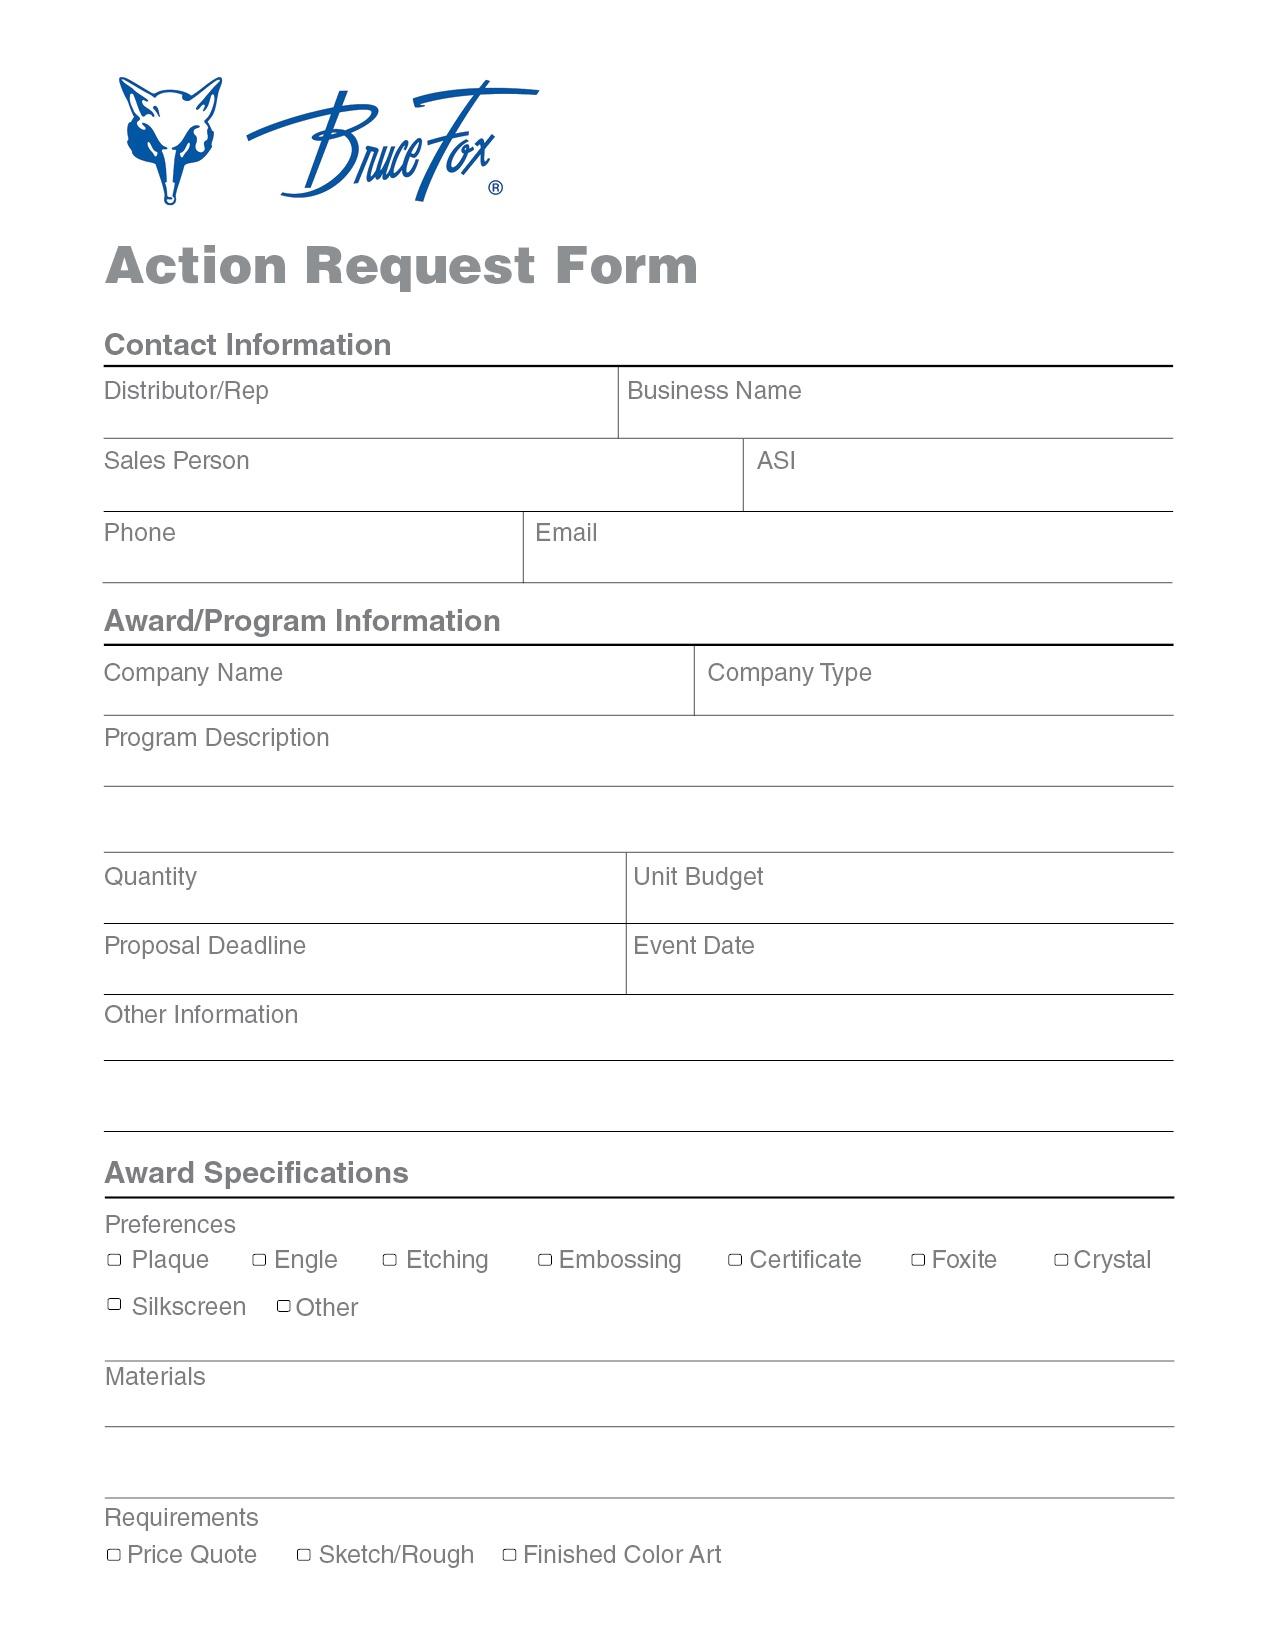 action request form bruce fox pdf online form